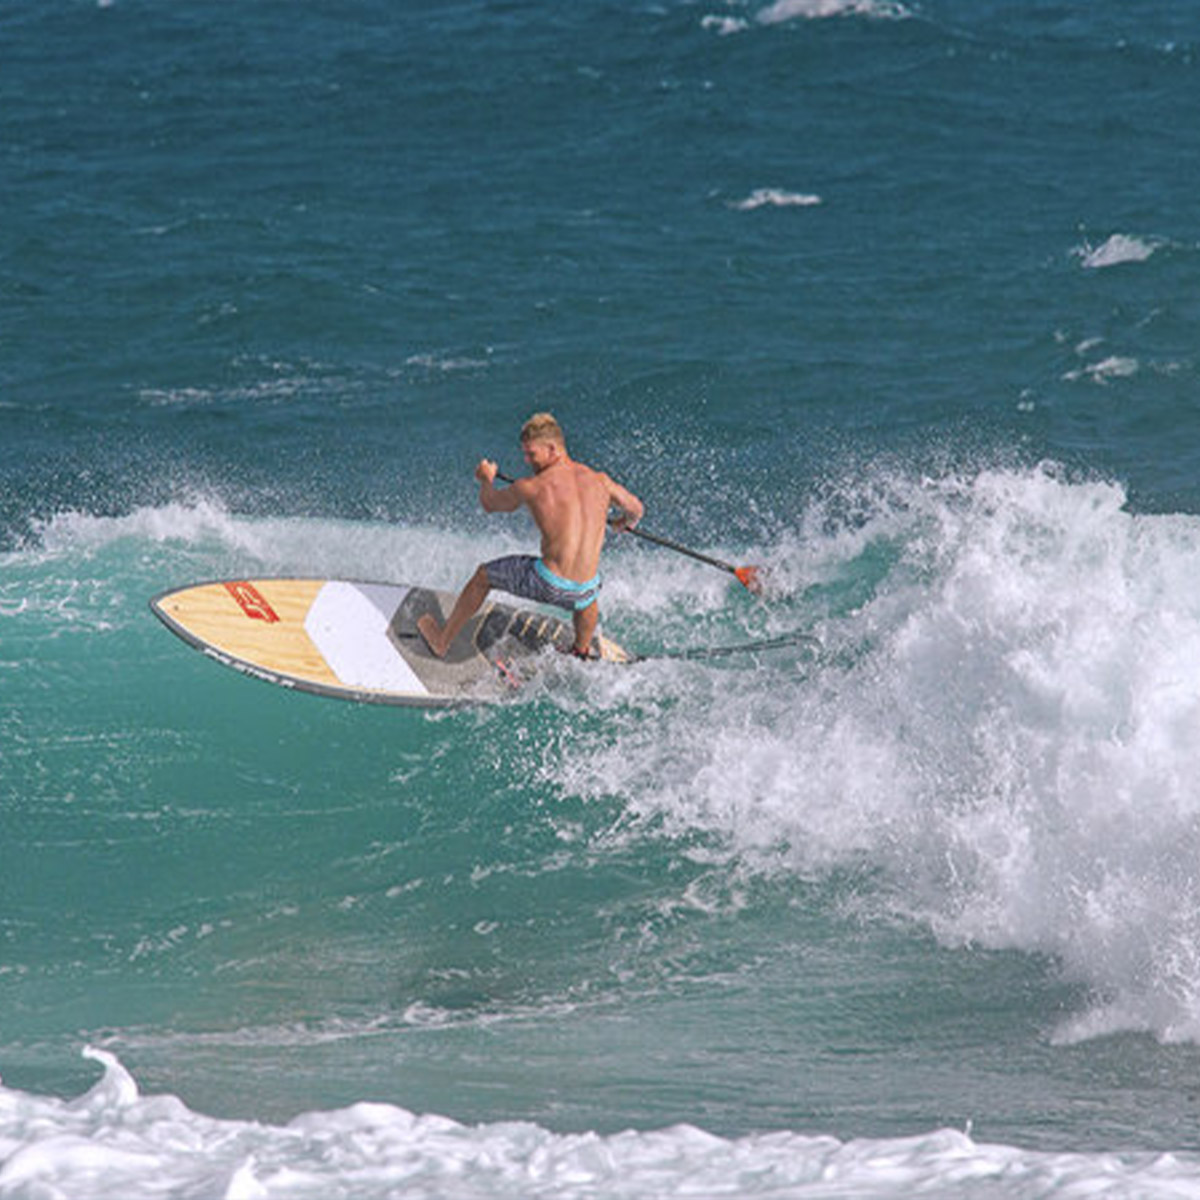 jp-surf-wood-edition-sup-board-2019-actionshot-1